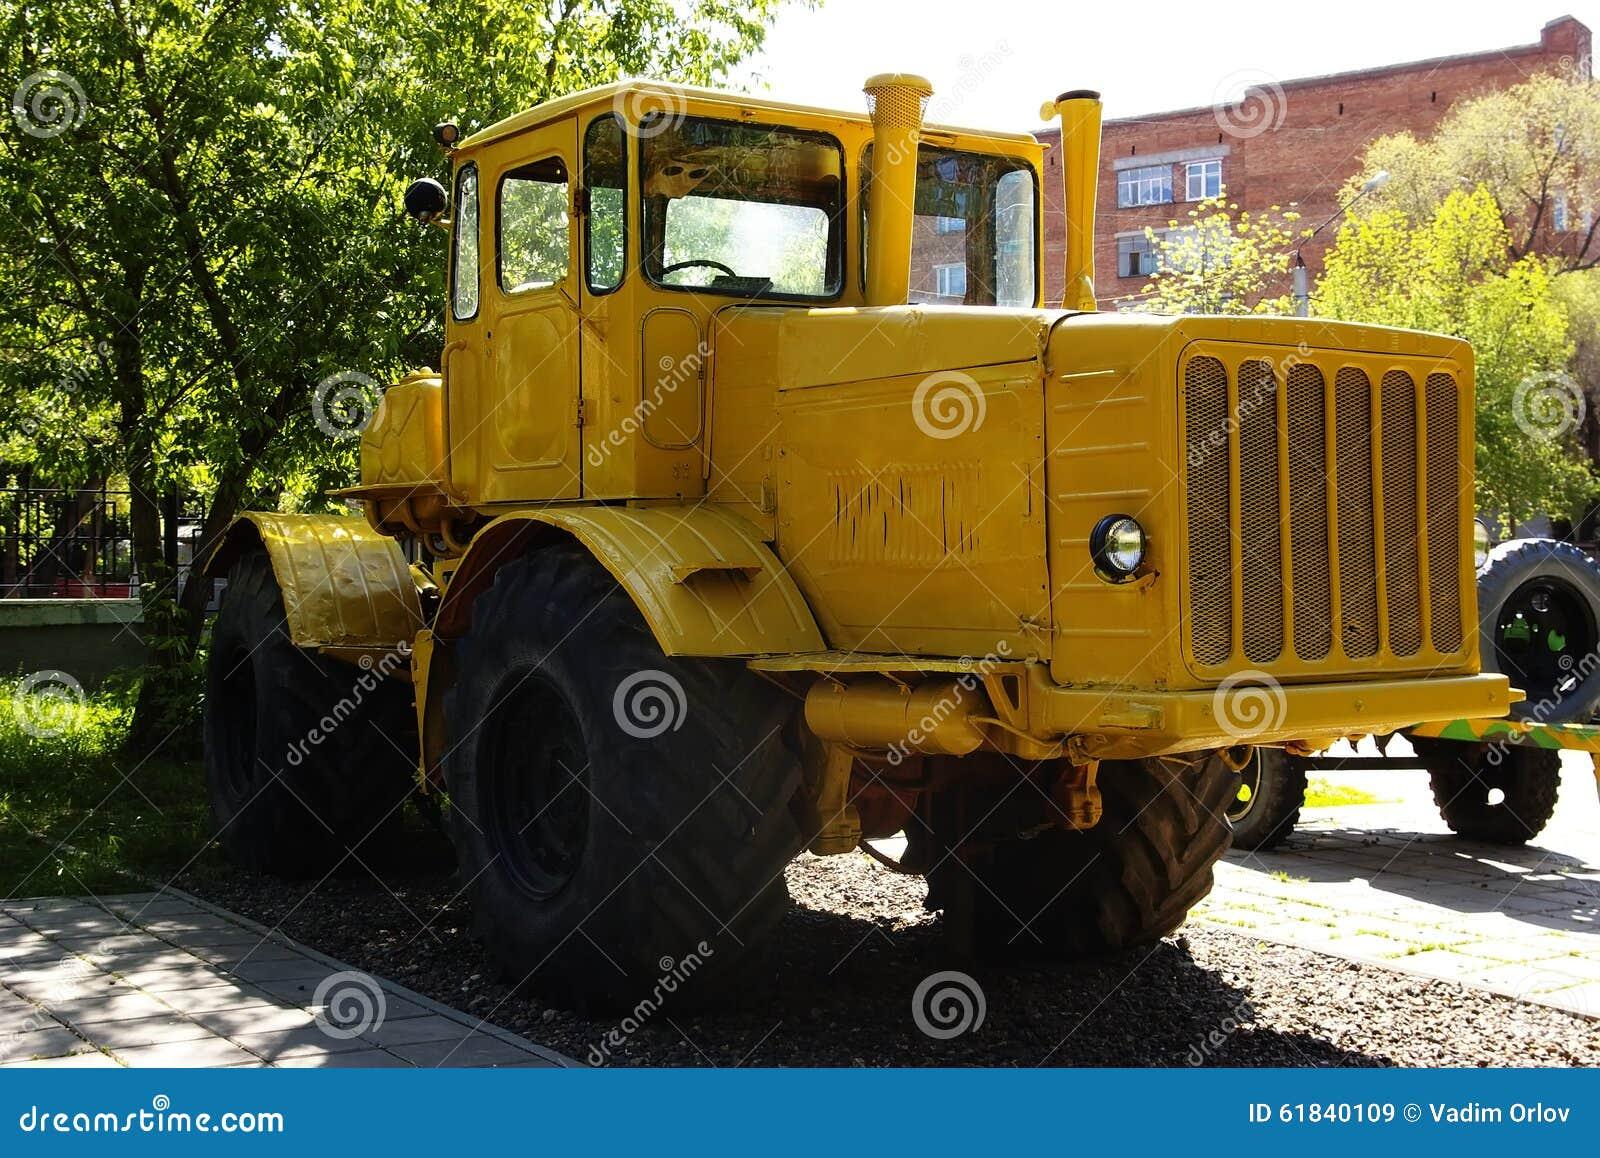 tractor k 700 kirovets stock photo image 61840109. Black Bedroom Furniture Sets. Home Design Ideas